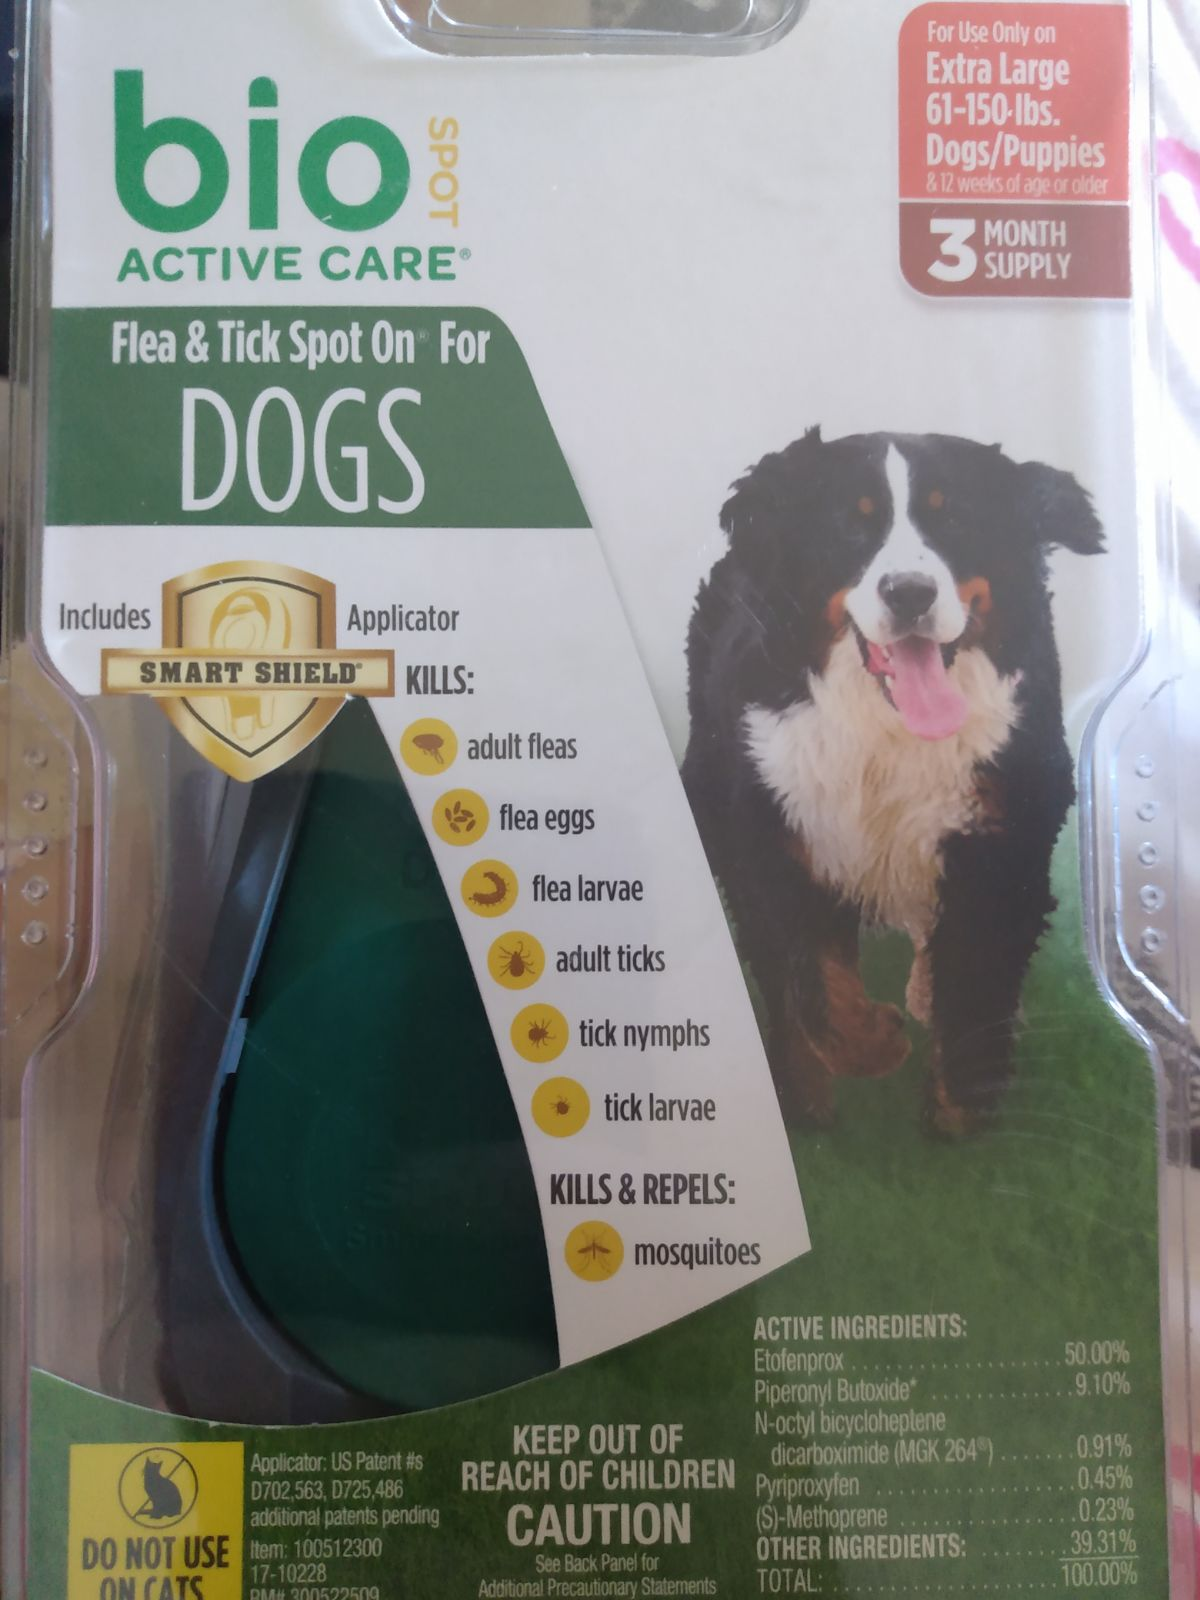 Bio Spot Flea Tick XL Dogs Puppies